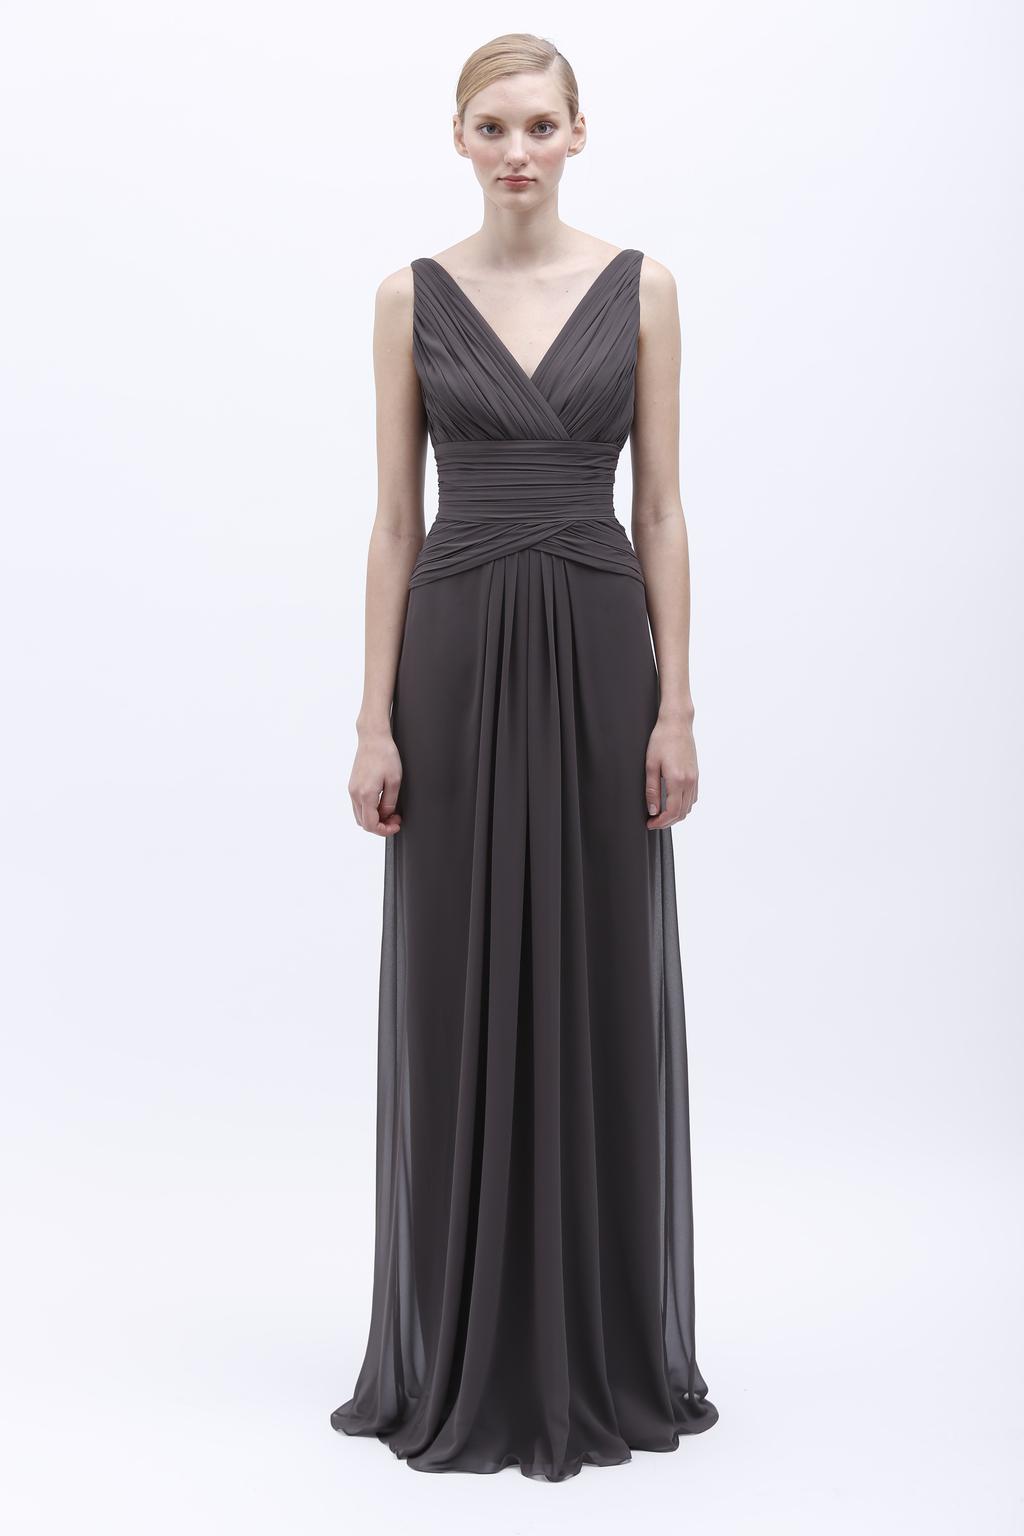 Monique lhuillier spring 2014 bridesmaid dress 450136 for Buy monique lhuillier wedding dress